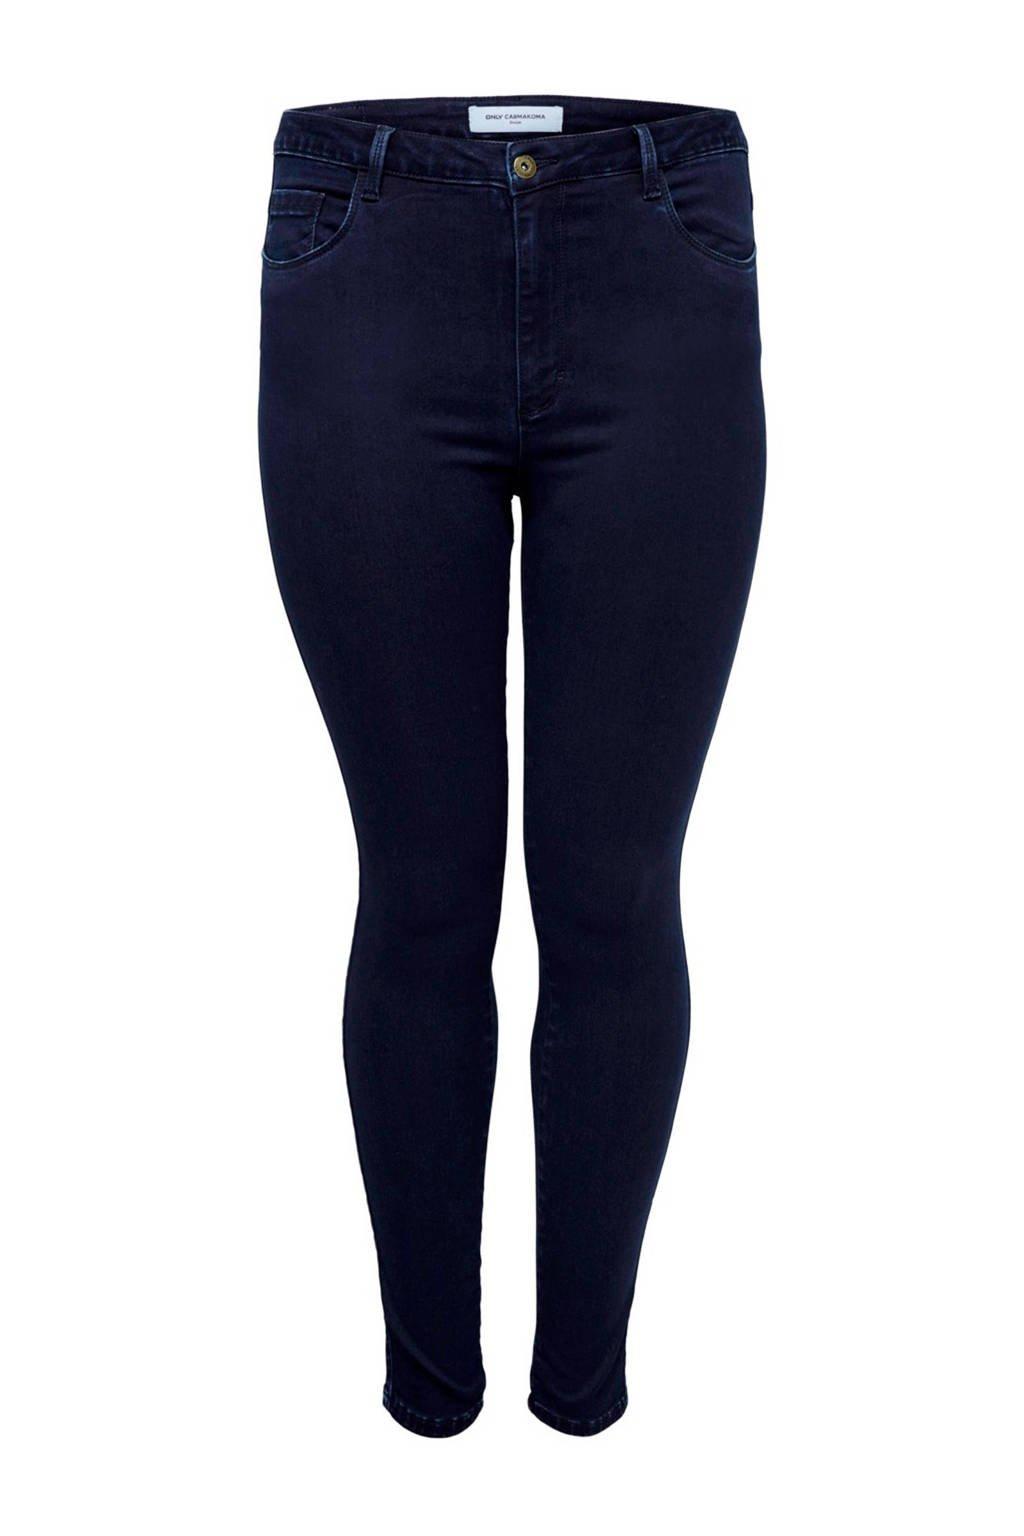 ONLY carmakoma skinny jeans, Donkerblauw